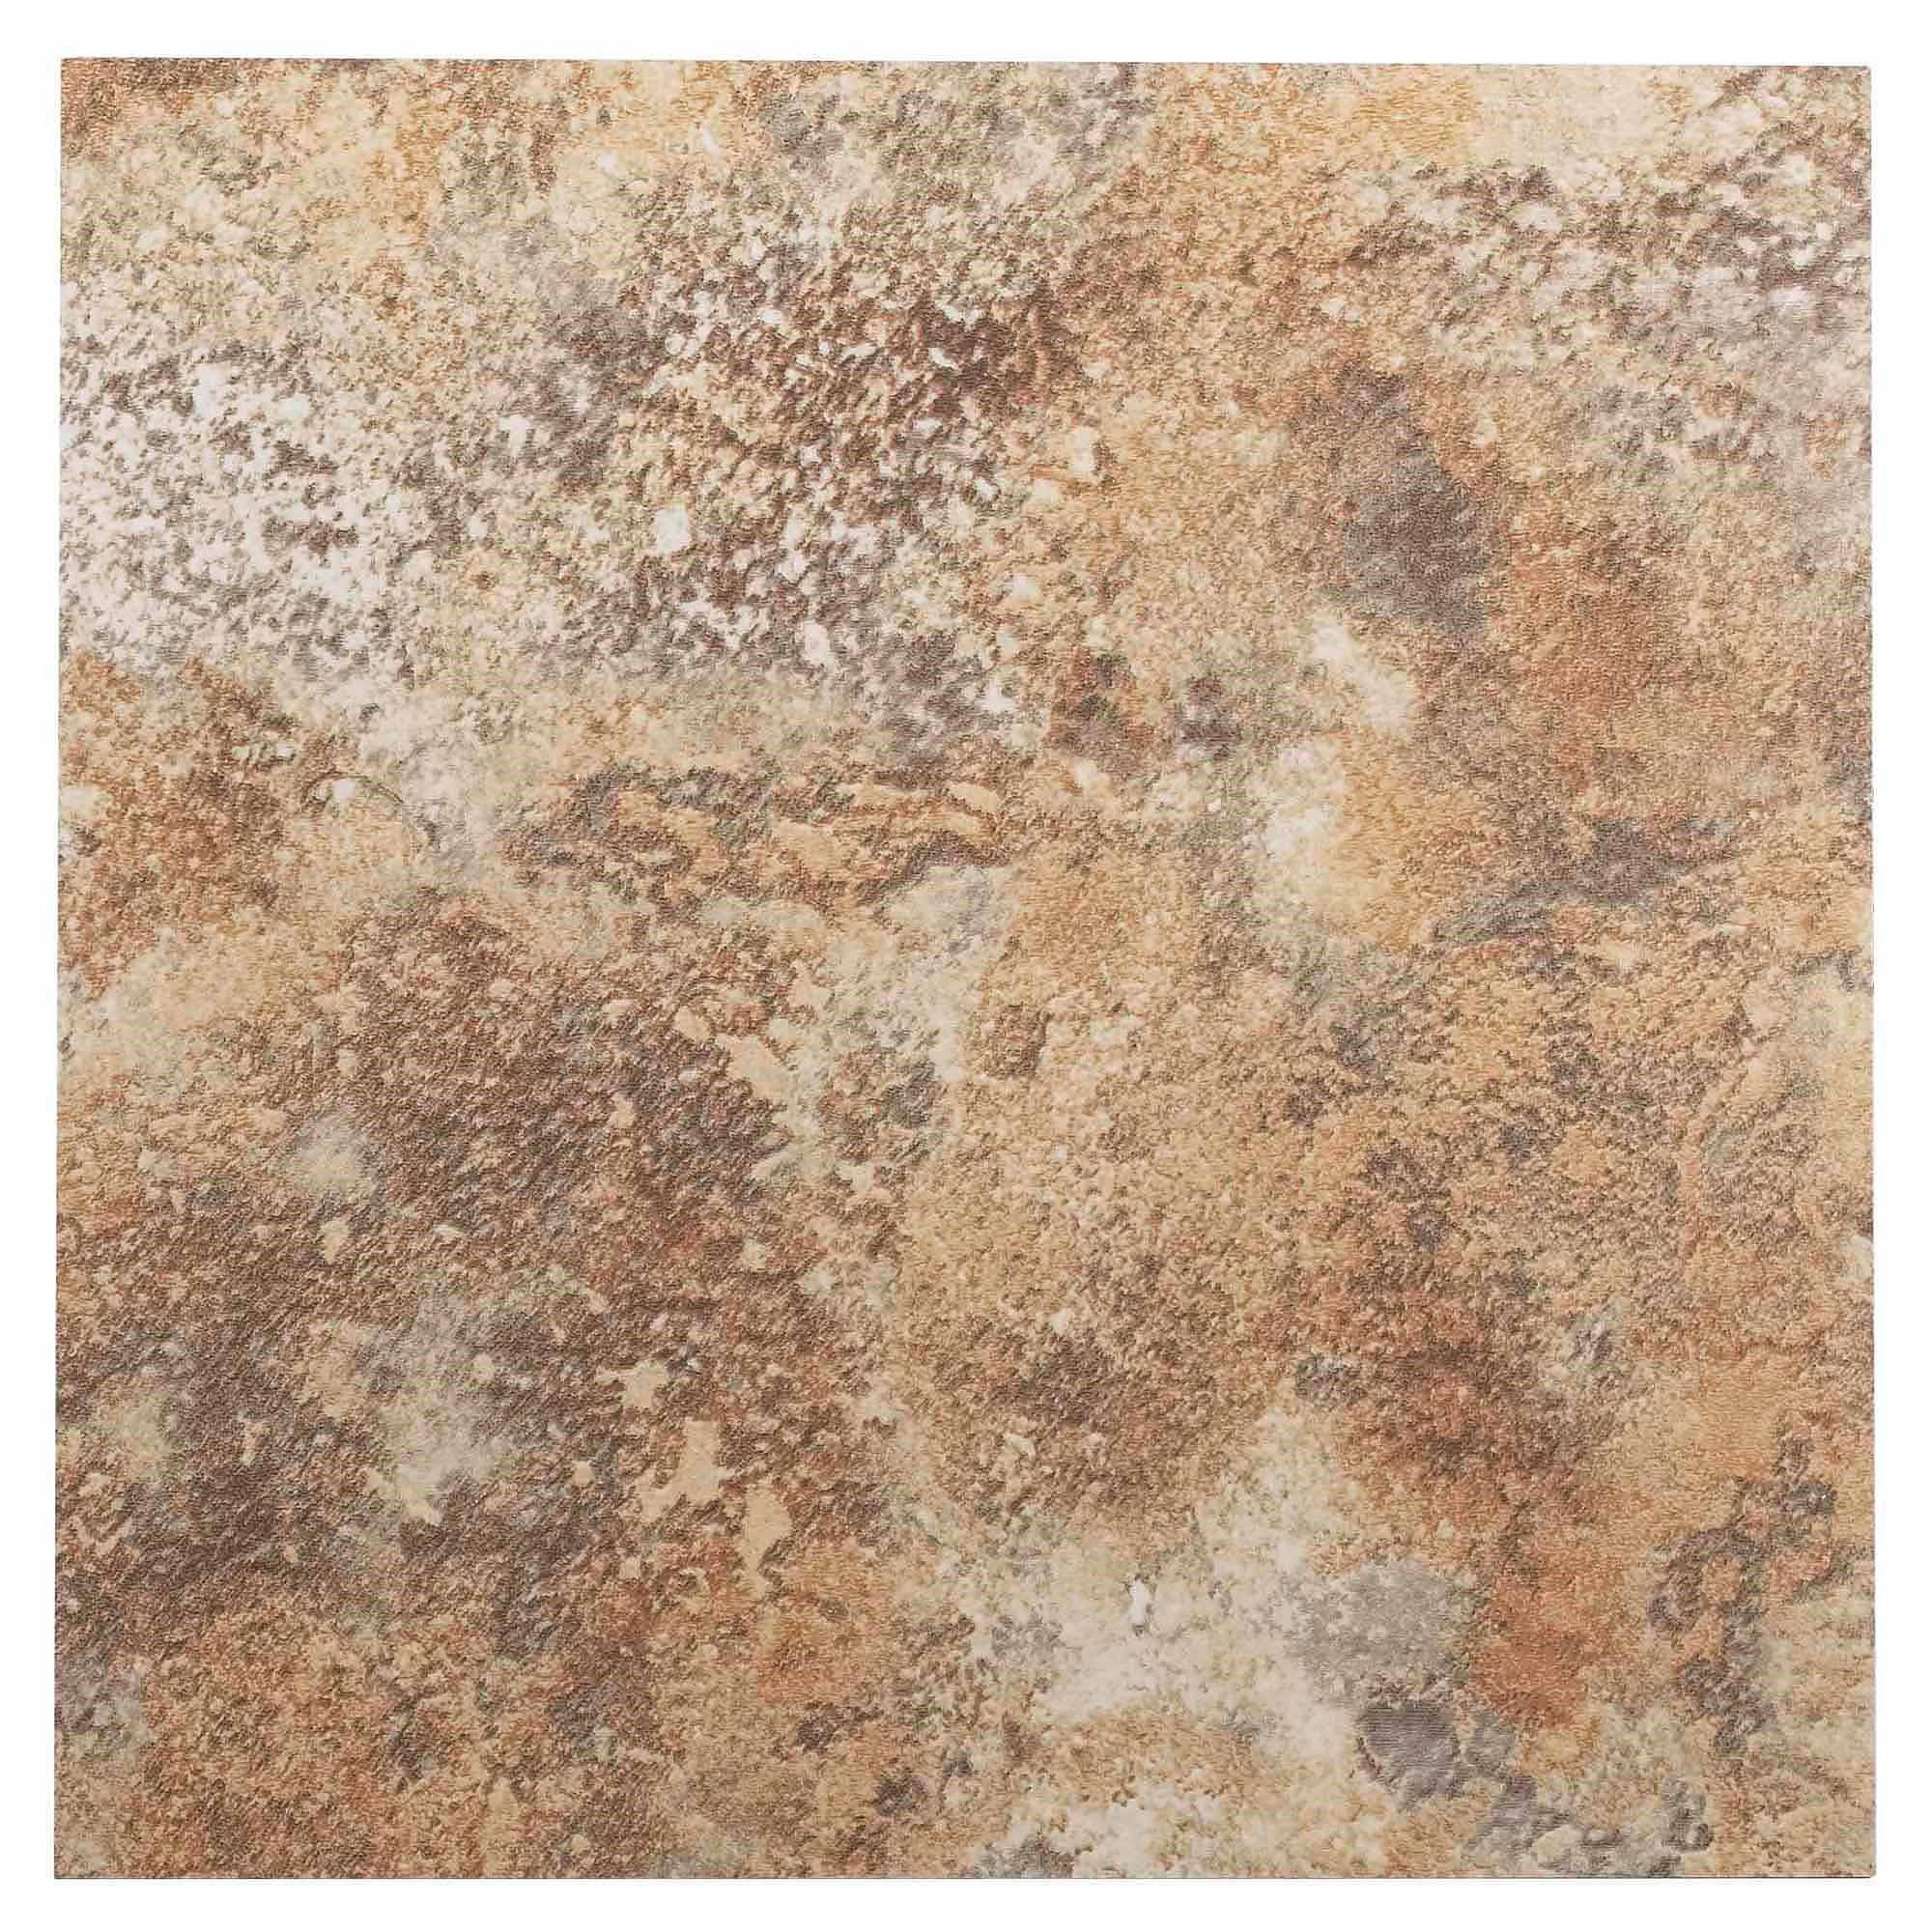 Installing self adhesive vinyl floor tile over linoleum tile designs nexus granite 12x12 self adhesive vinyl floor tile 20 tiles dailygadgetfo Images